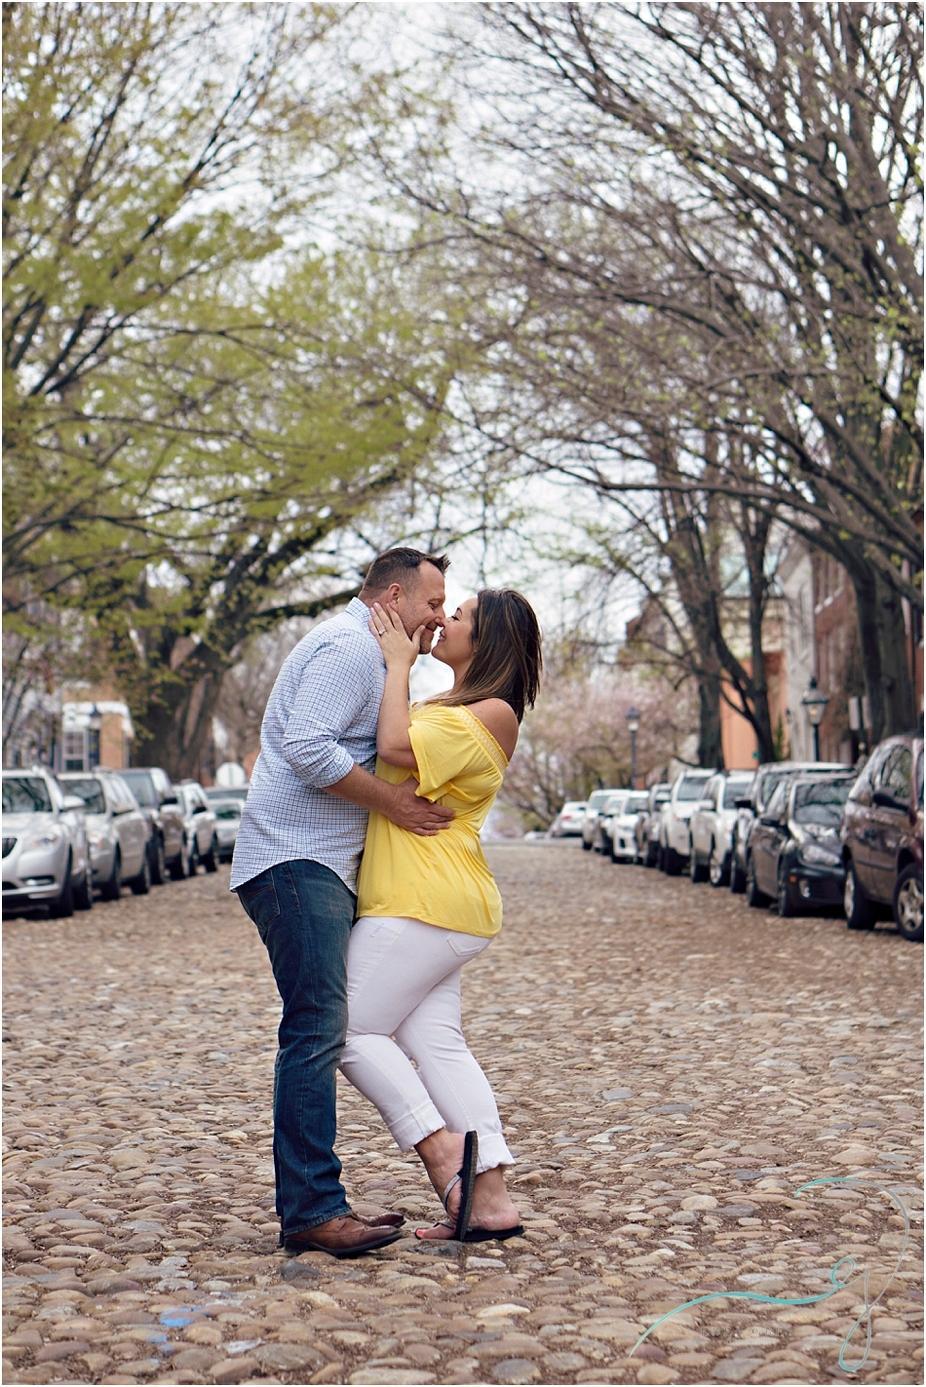 Old Town Alexandria engagement photographers, Virginia Wedding Photographer, Pippin Hill Weddings